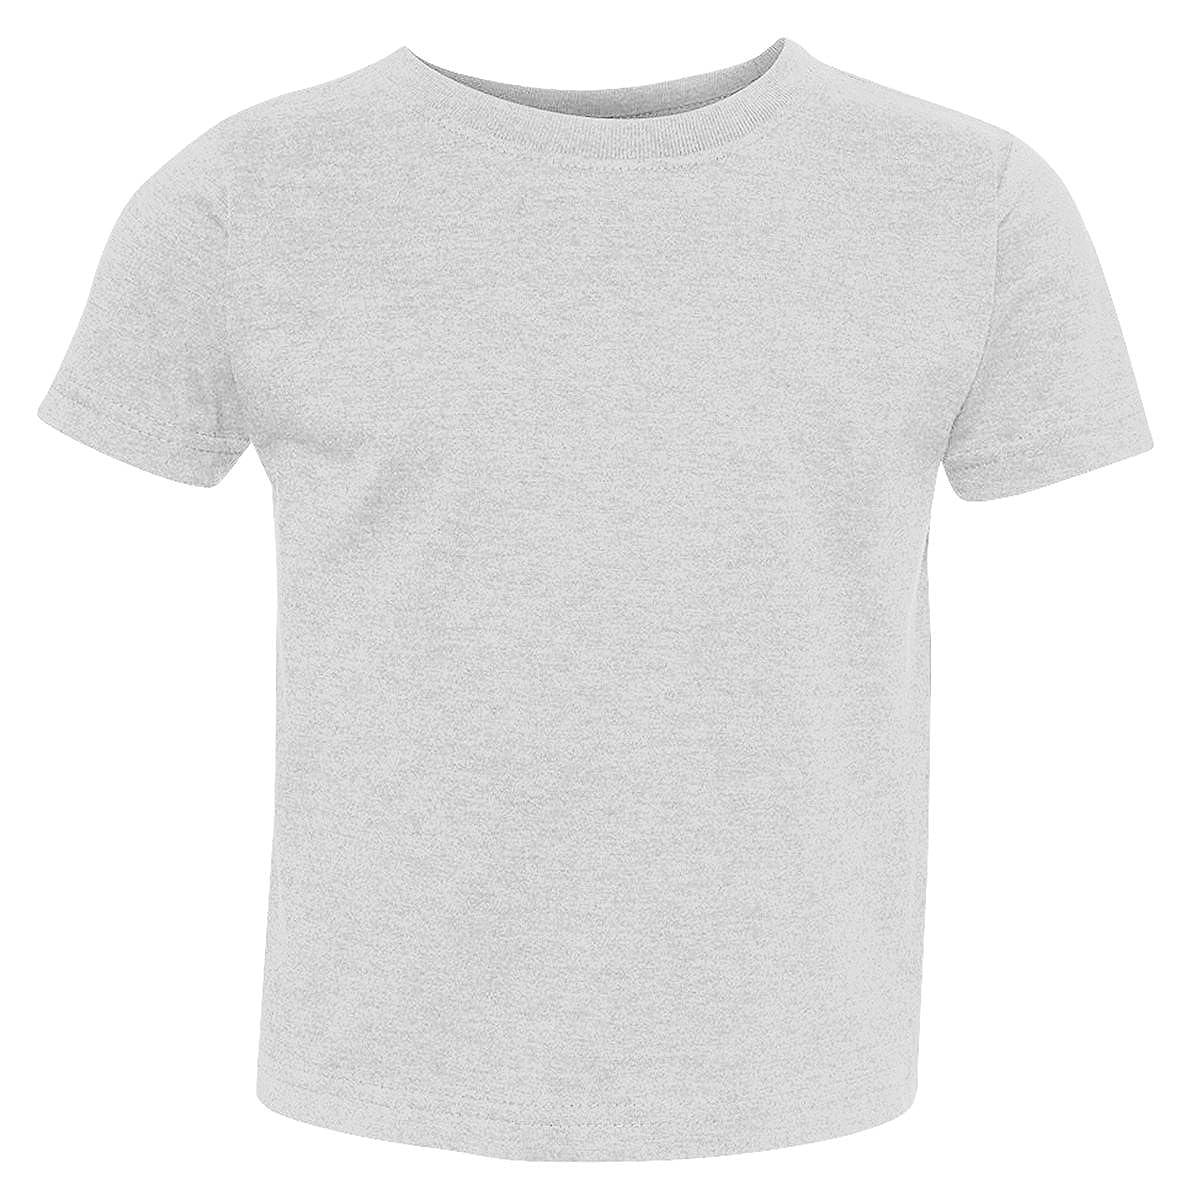 Rabbit Skins RS3305 Toddler Vintage Heathered Fine Jersey T-Shirt